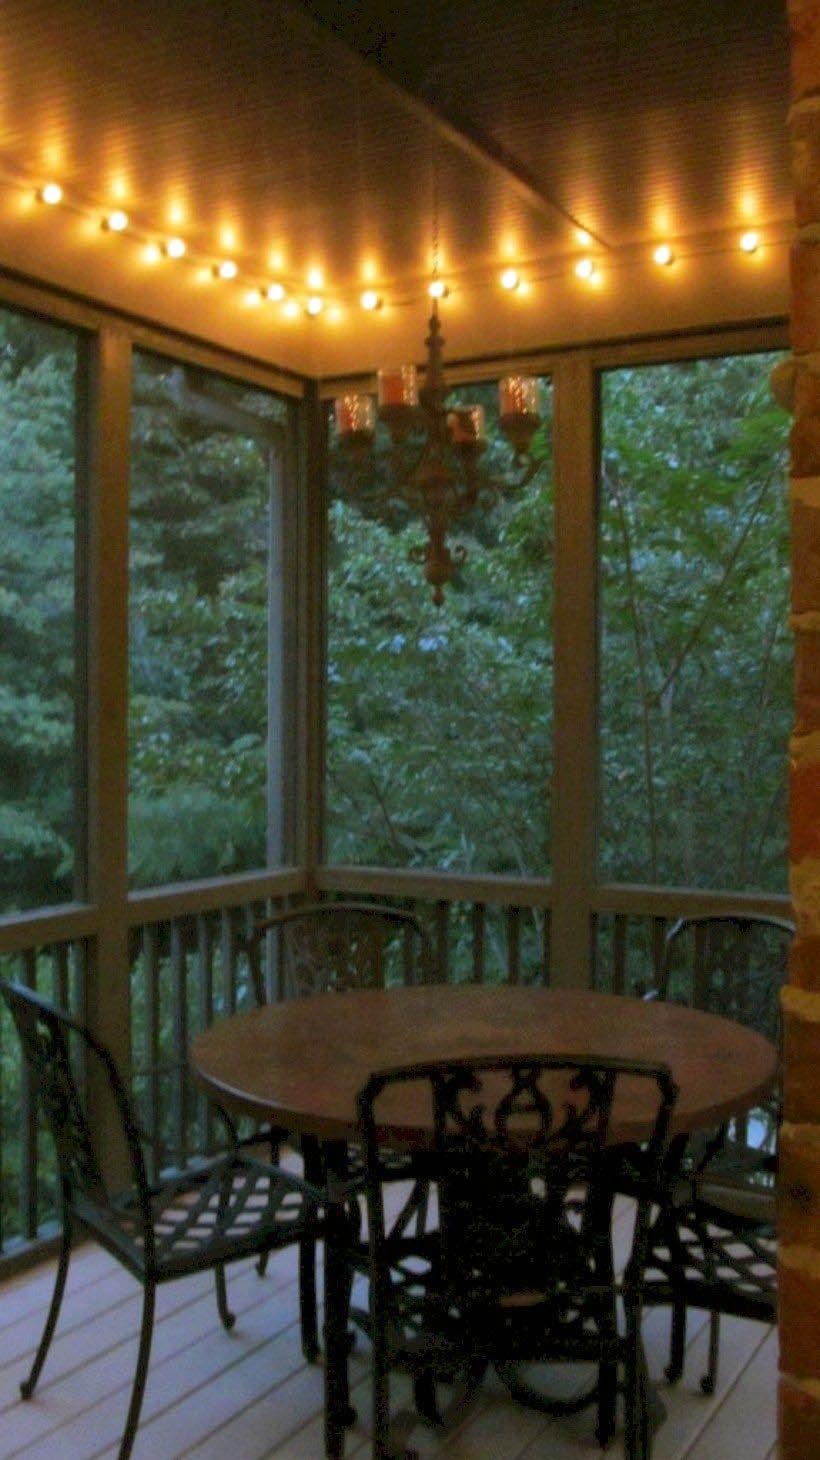 Extraordinary Green Porch Lights For Veterans You Ll Love Porch Makeover Patio Porch Lighting